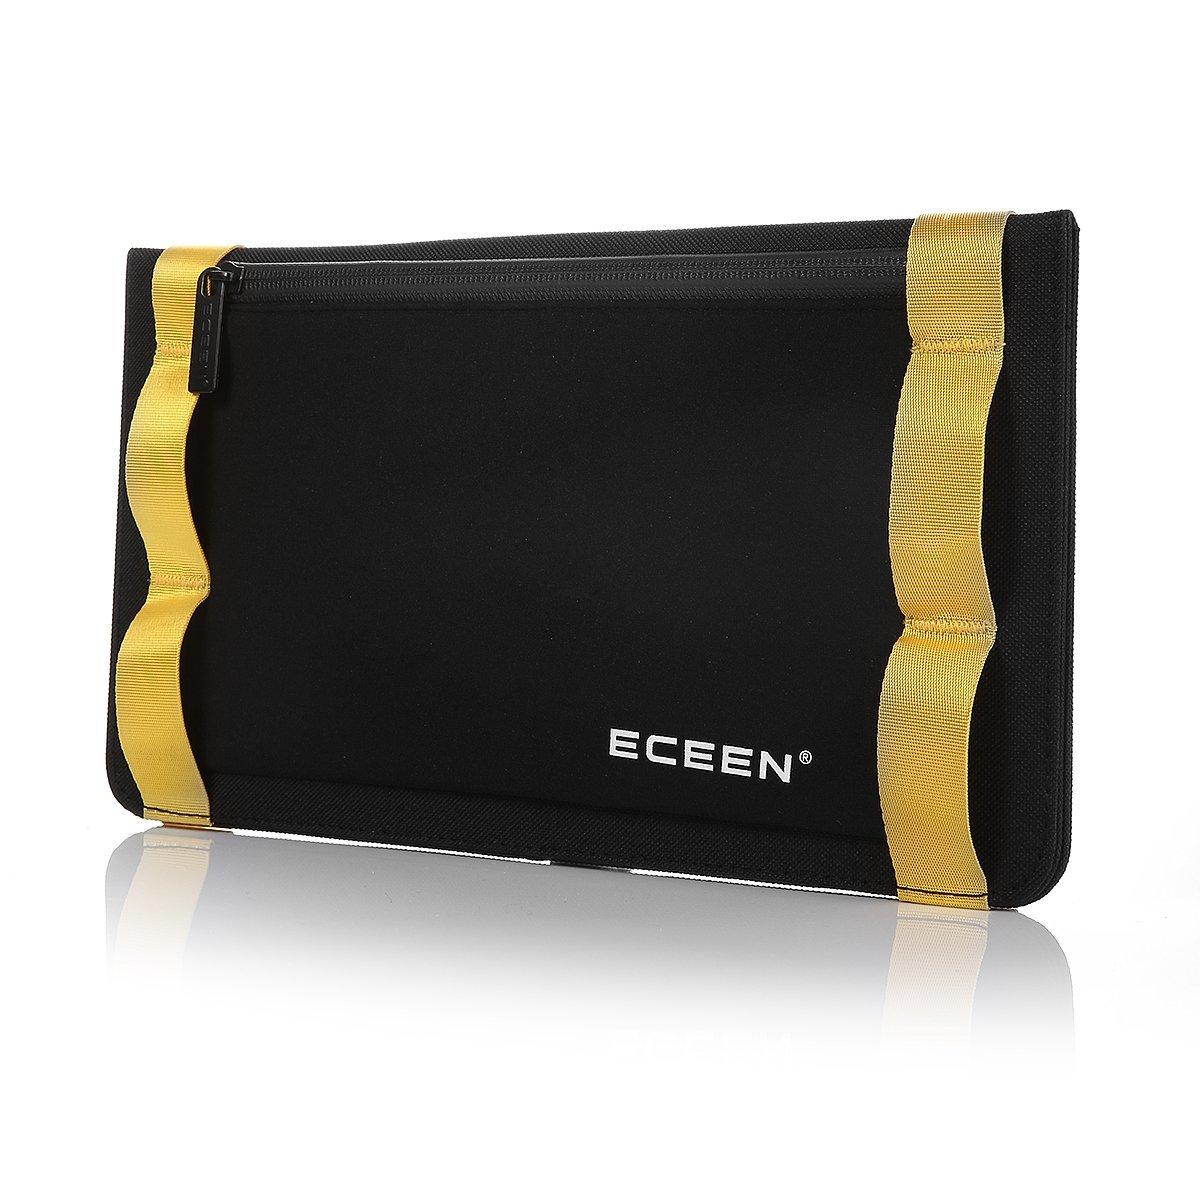 amazon com eceen 13w 2 port usb universal foldable solar charger